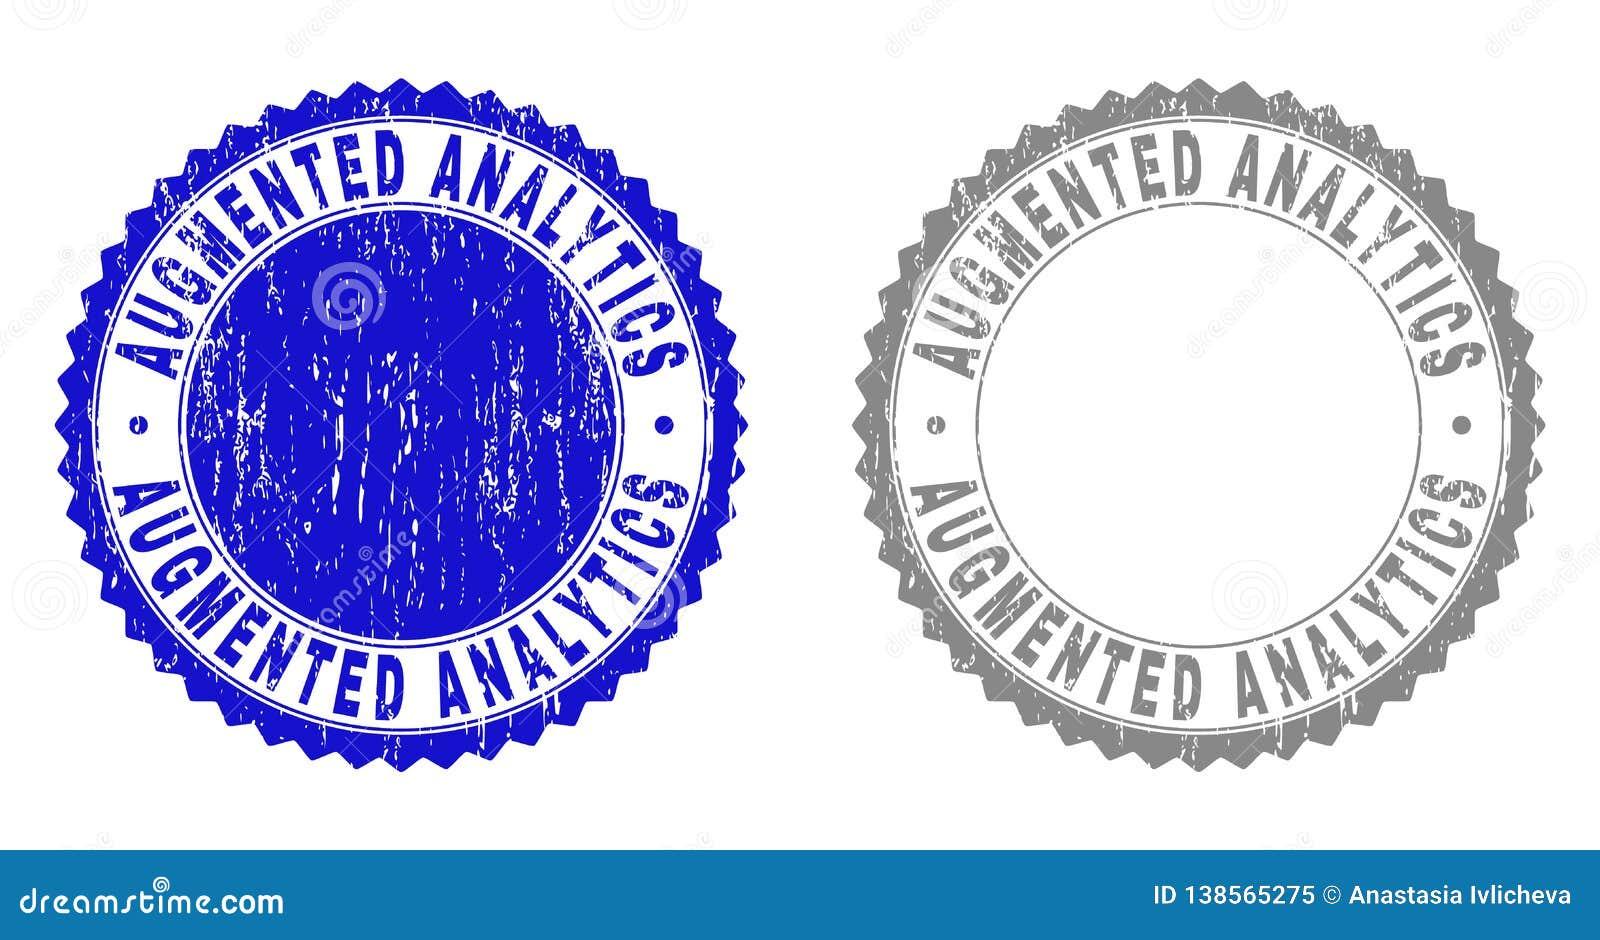 Textured AUGMENTED ANALYTICS Scratched Stamp Seals